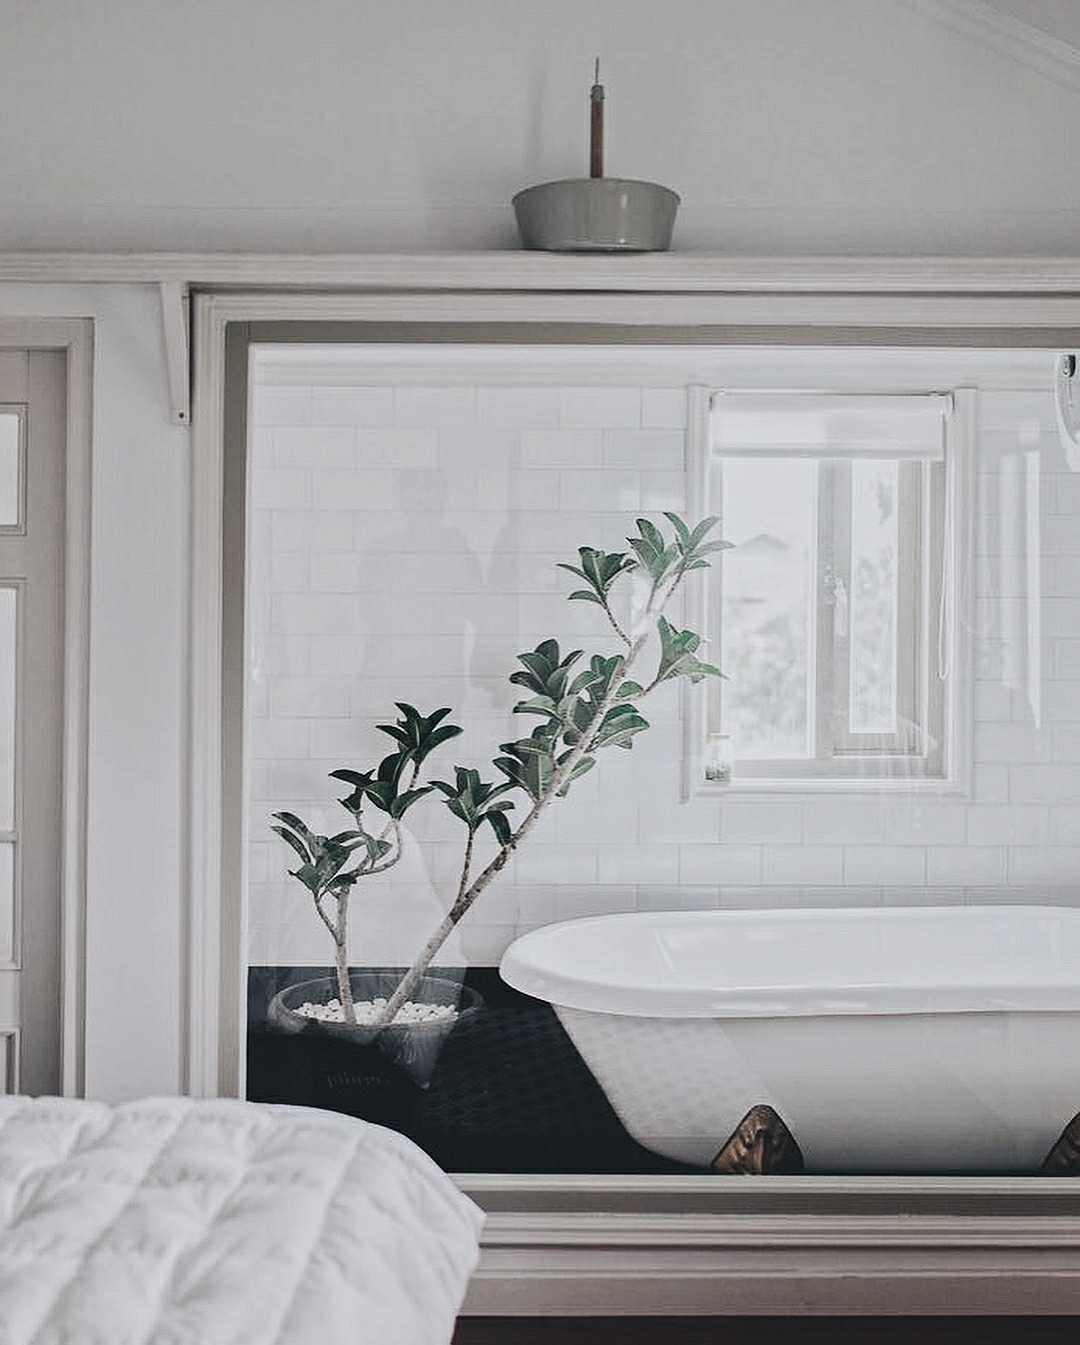 Kamar mandi yang berada dekat dengan kamar tidur dipasangi sebuah bathtub kecil yang tampak nyaman. Sebuah pot berisi bunga menjadi hiasan sekaligus menyegarkan suasana di dalamnya. Cocok sekali untuk Anda yang ingin menghabiskan waktu lama berendam di air hangat sambil melepaskan lelah. Menarik, bukan?